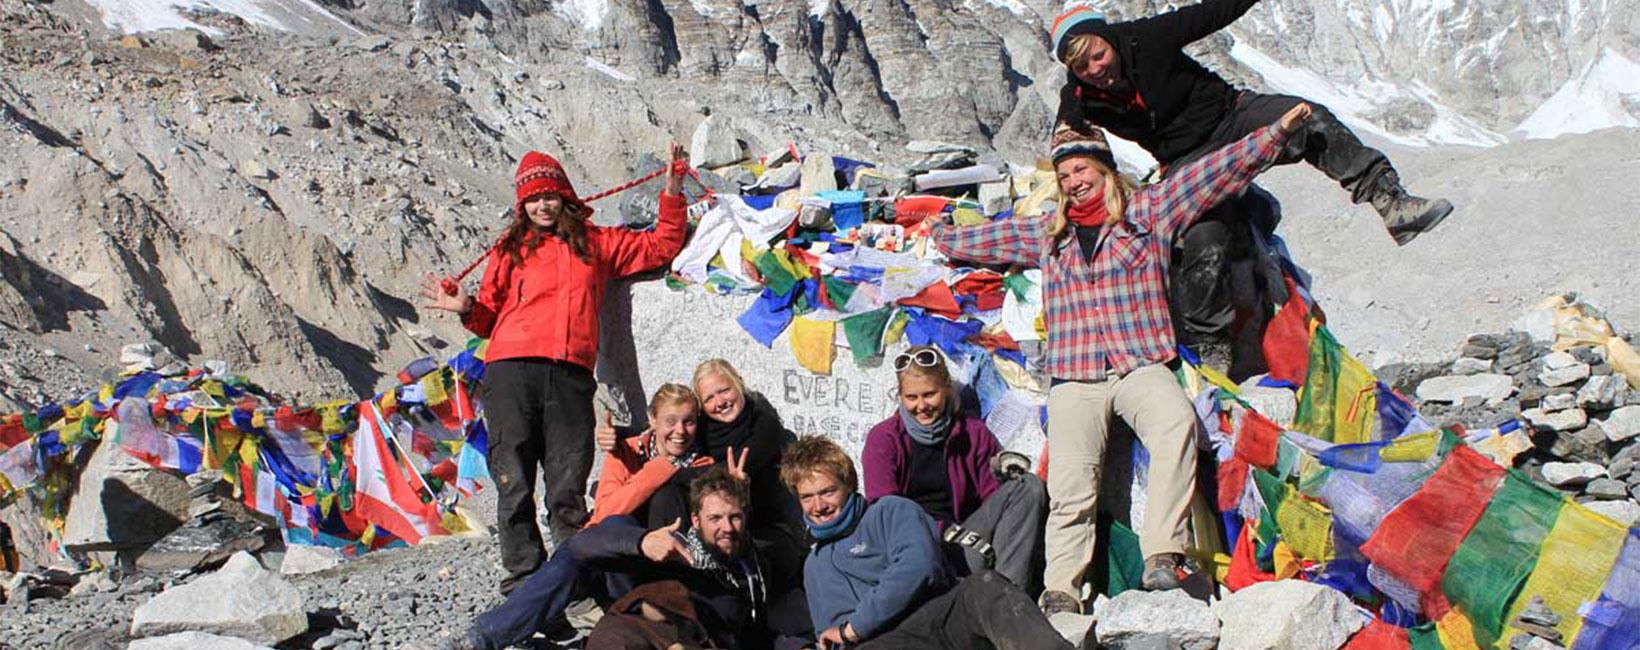 Nepal as a post covid 19- Gap Year Destination